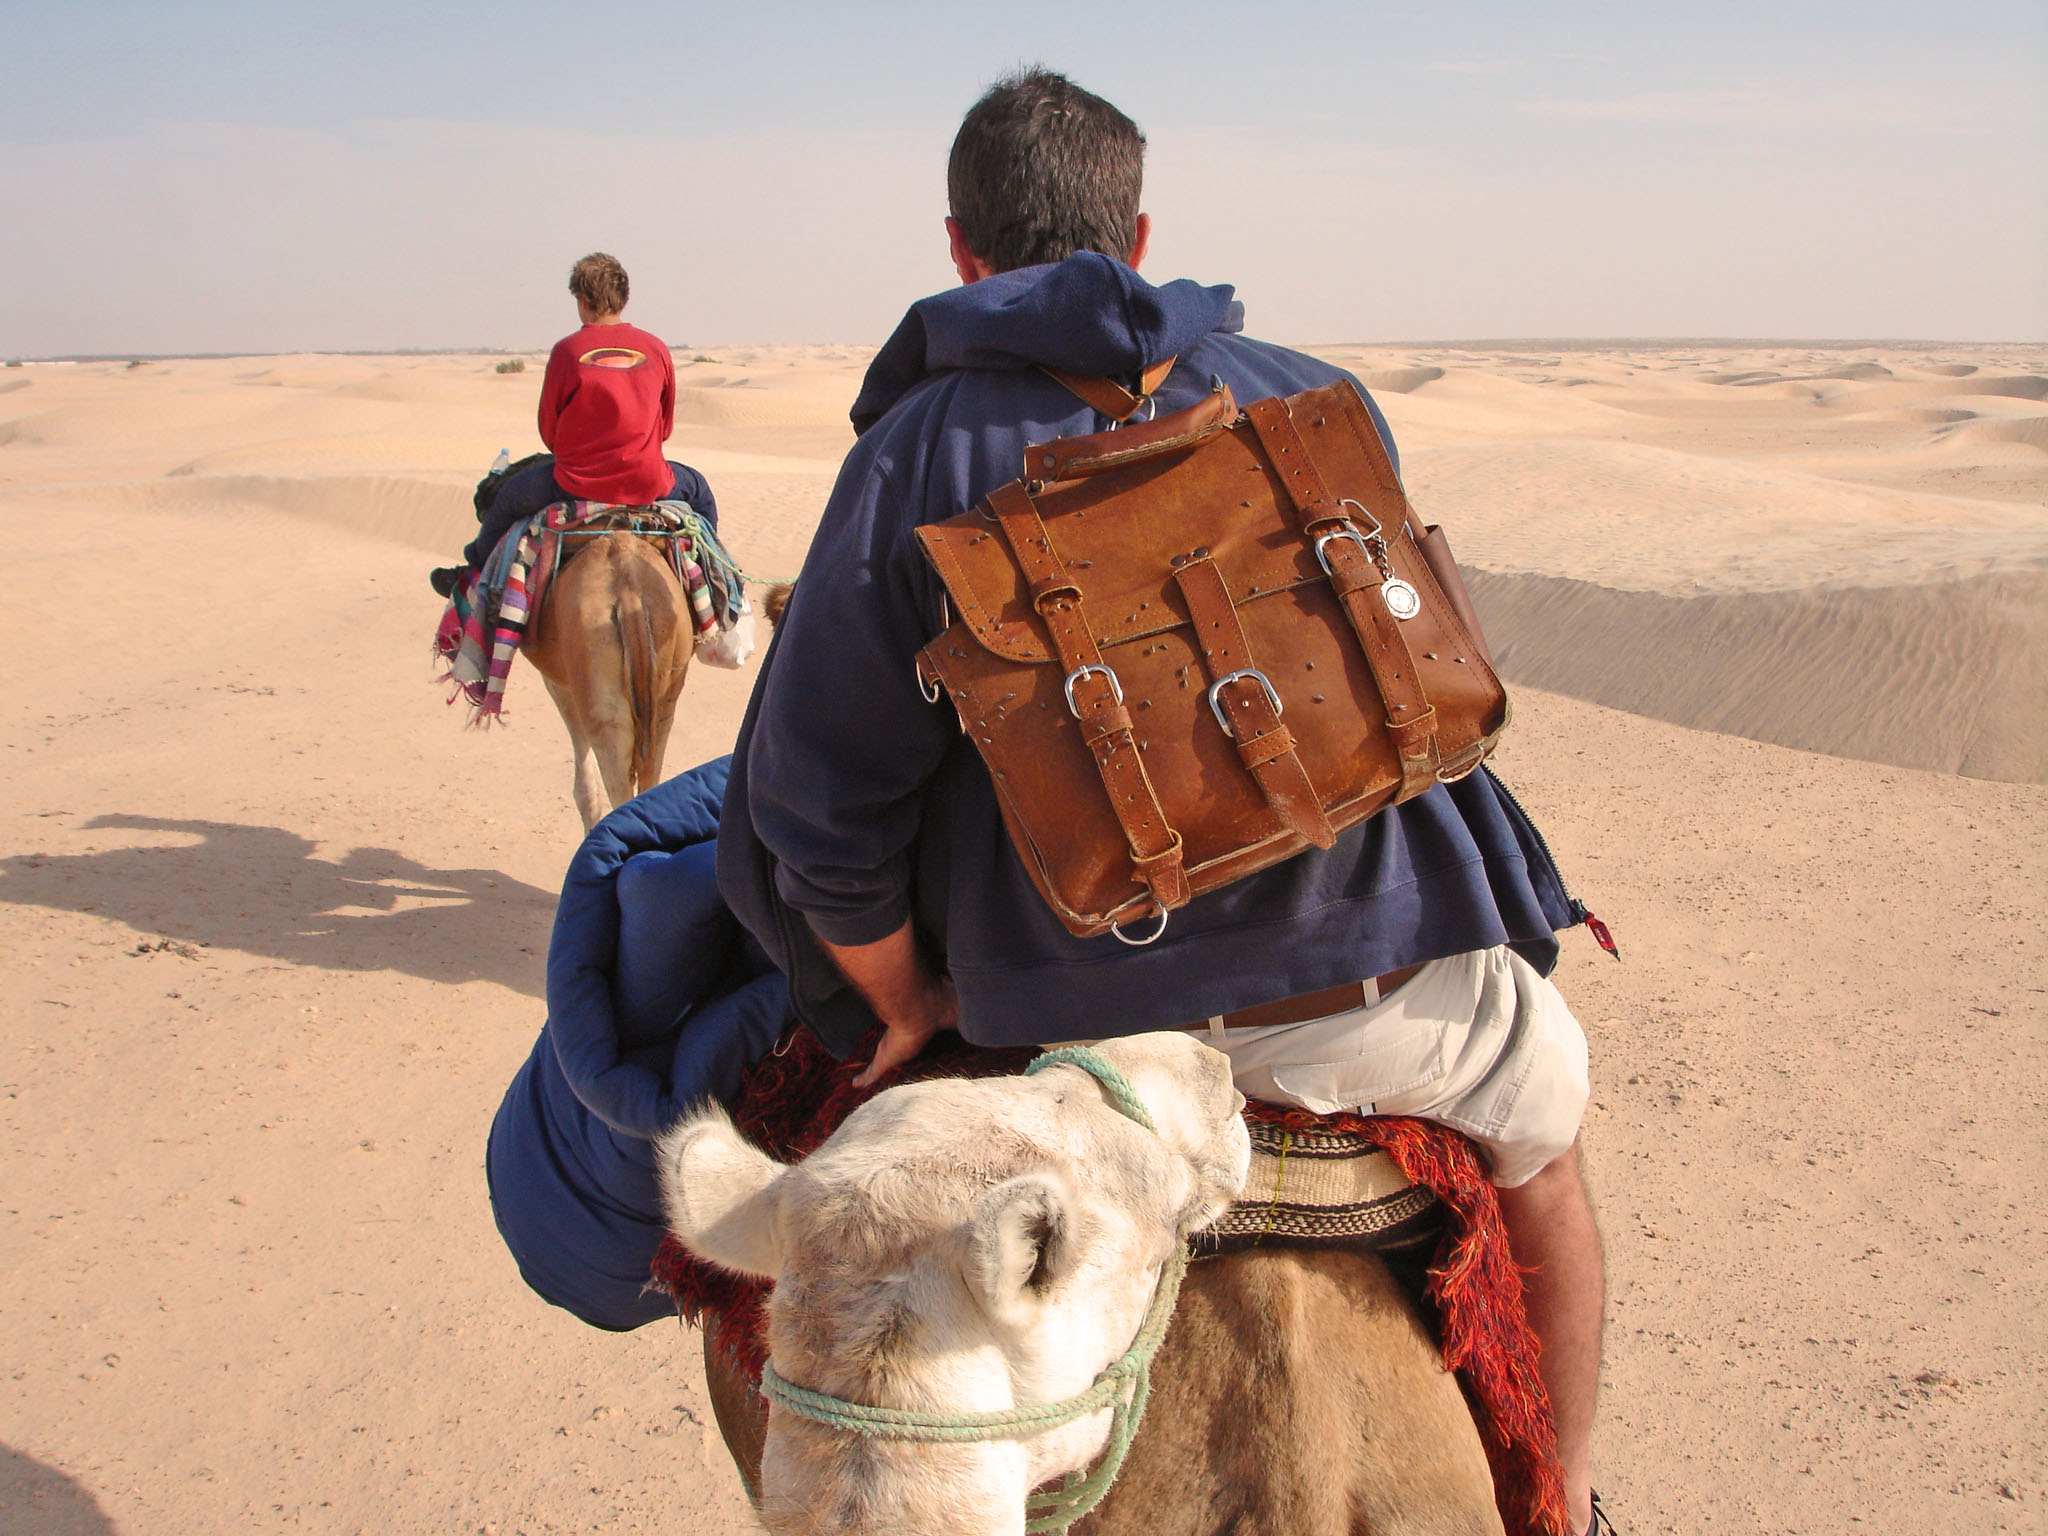 travel chess set in the sahara desert in leather satchel